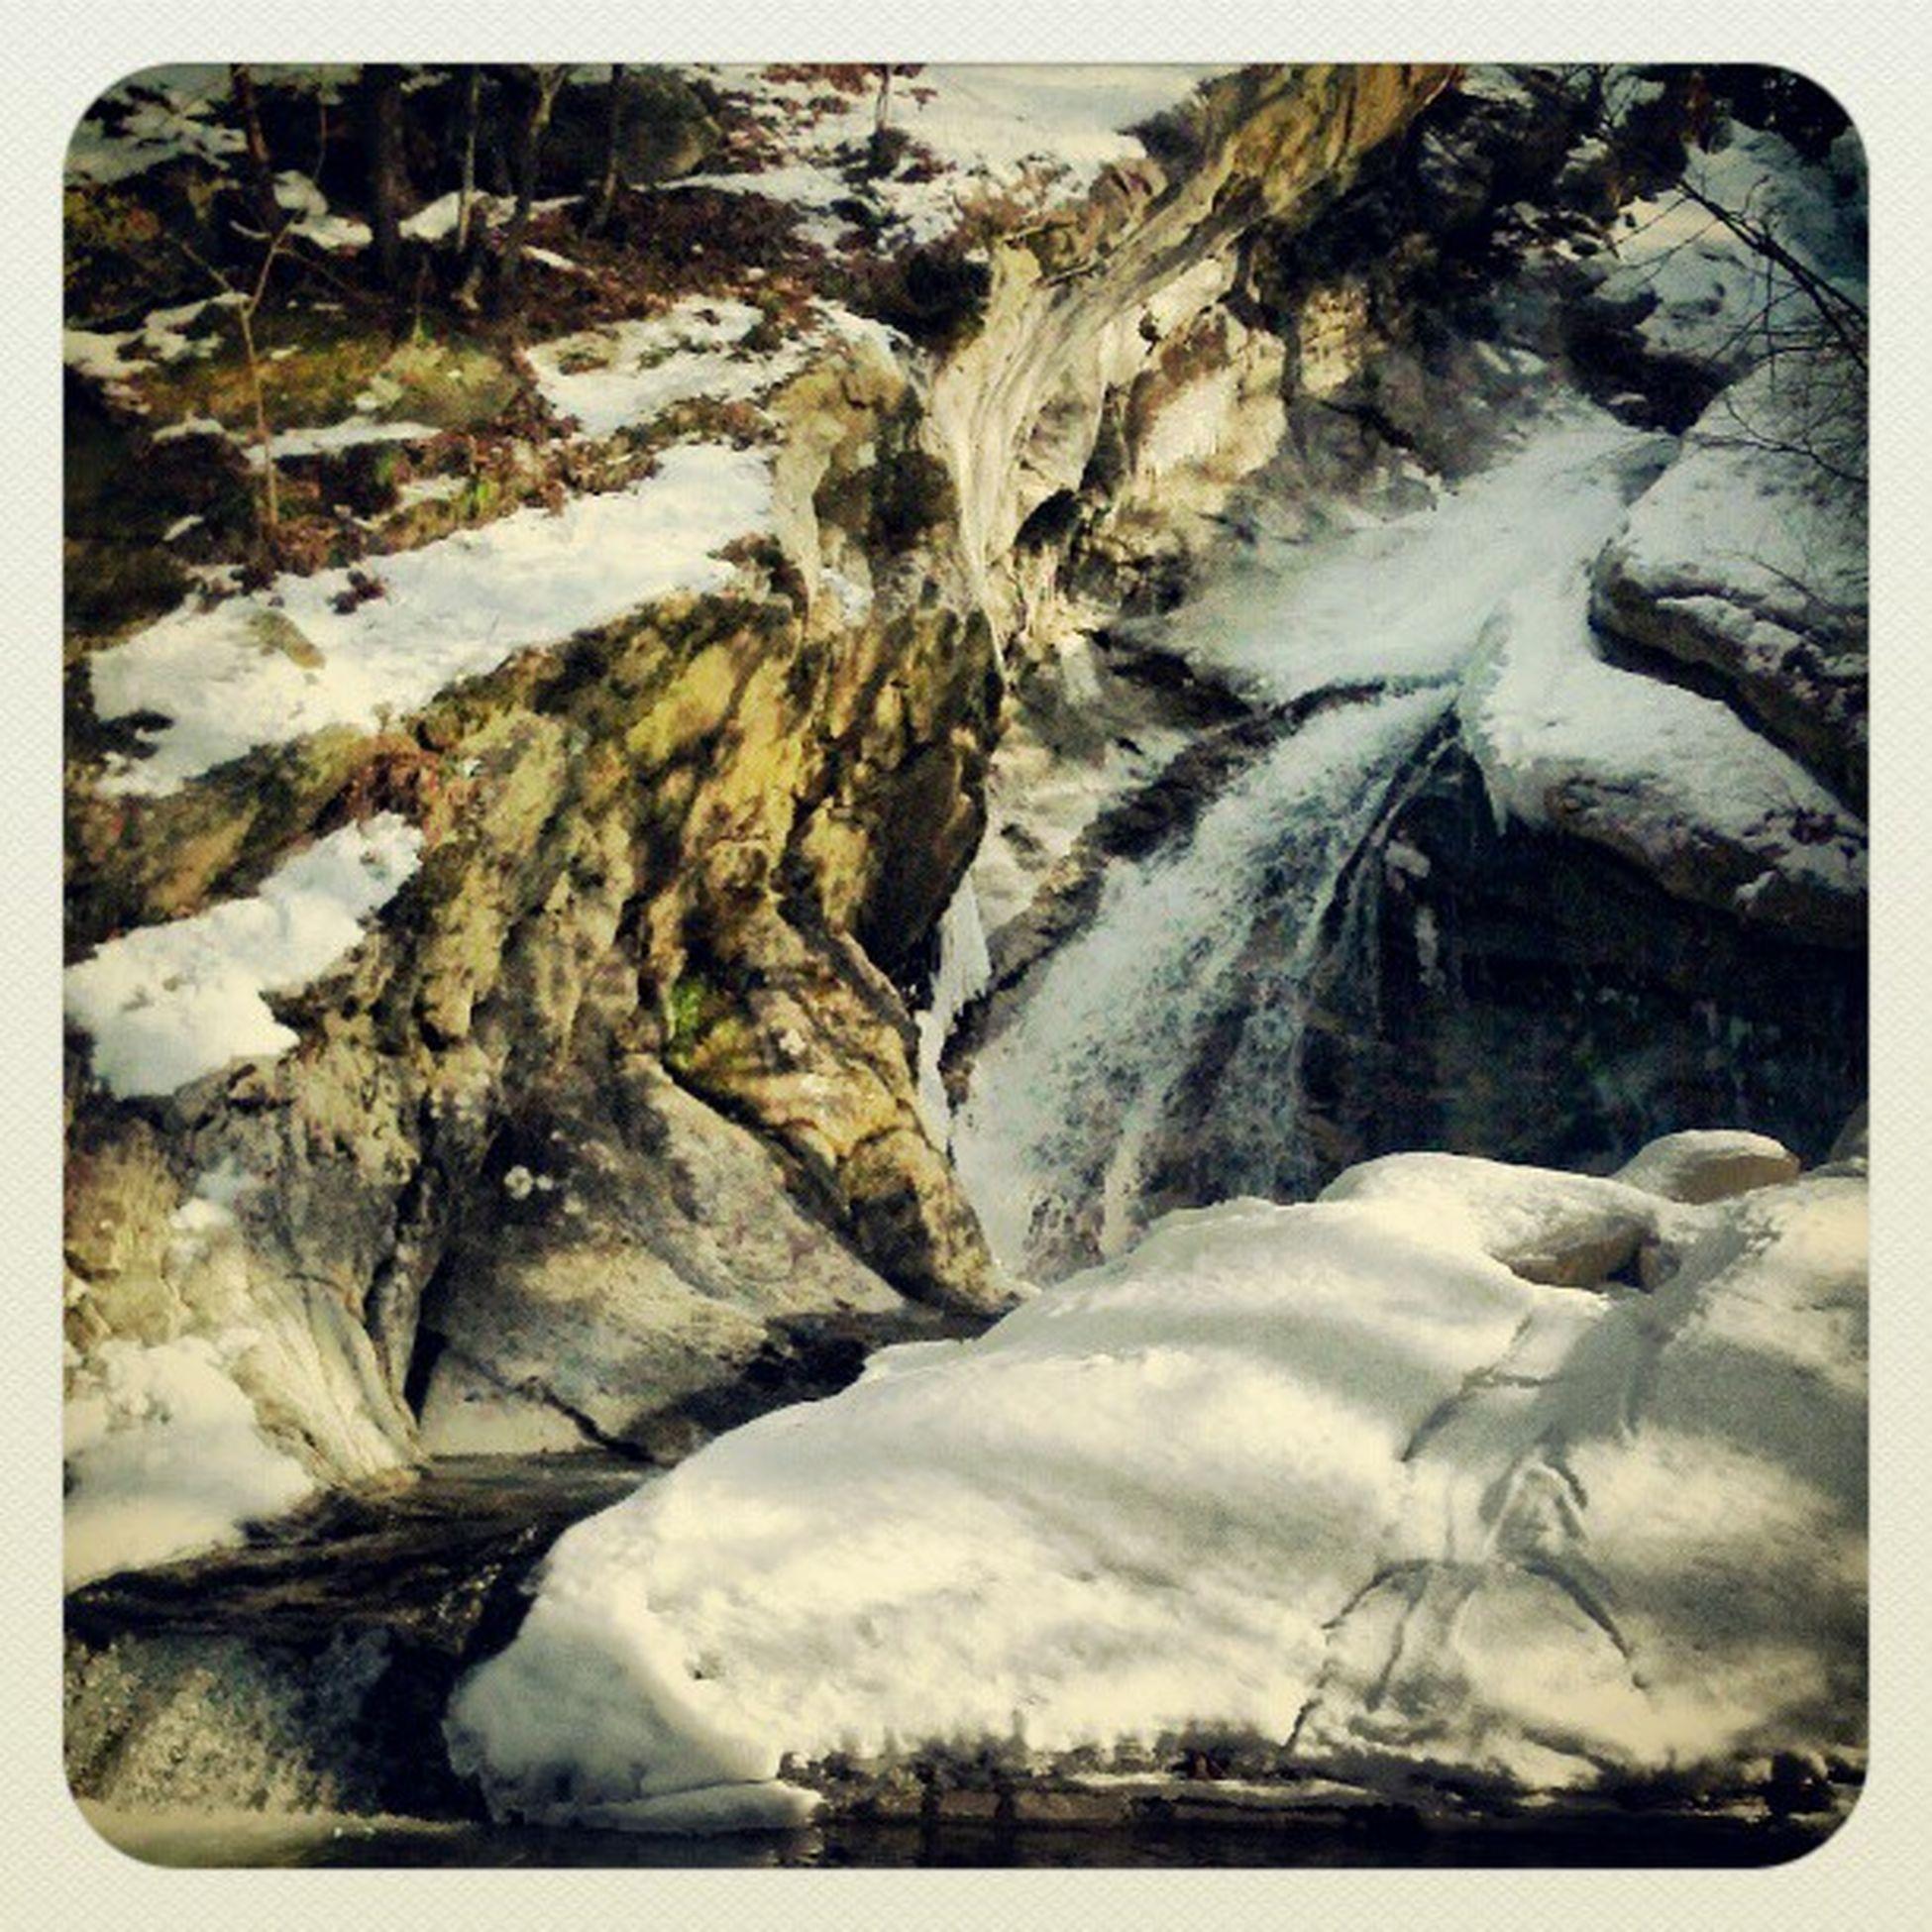 Waterfall Icicles Iceeverywhere Frozencreek Snow stillsnowing waterturnsintoice eastcoast upstateny energy